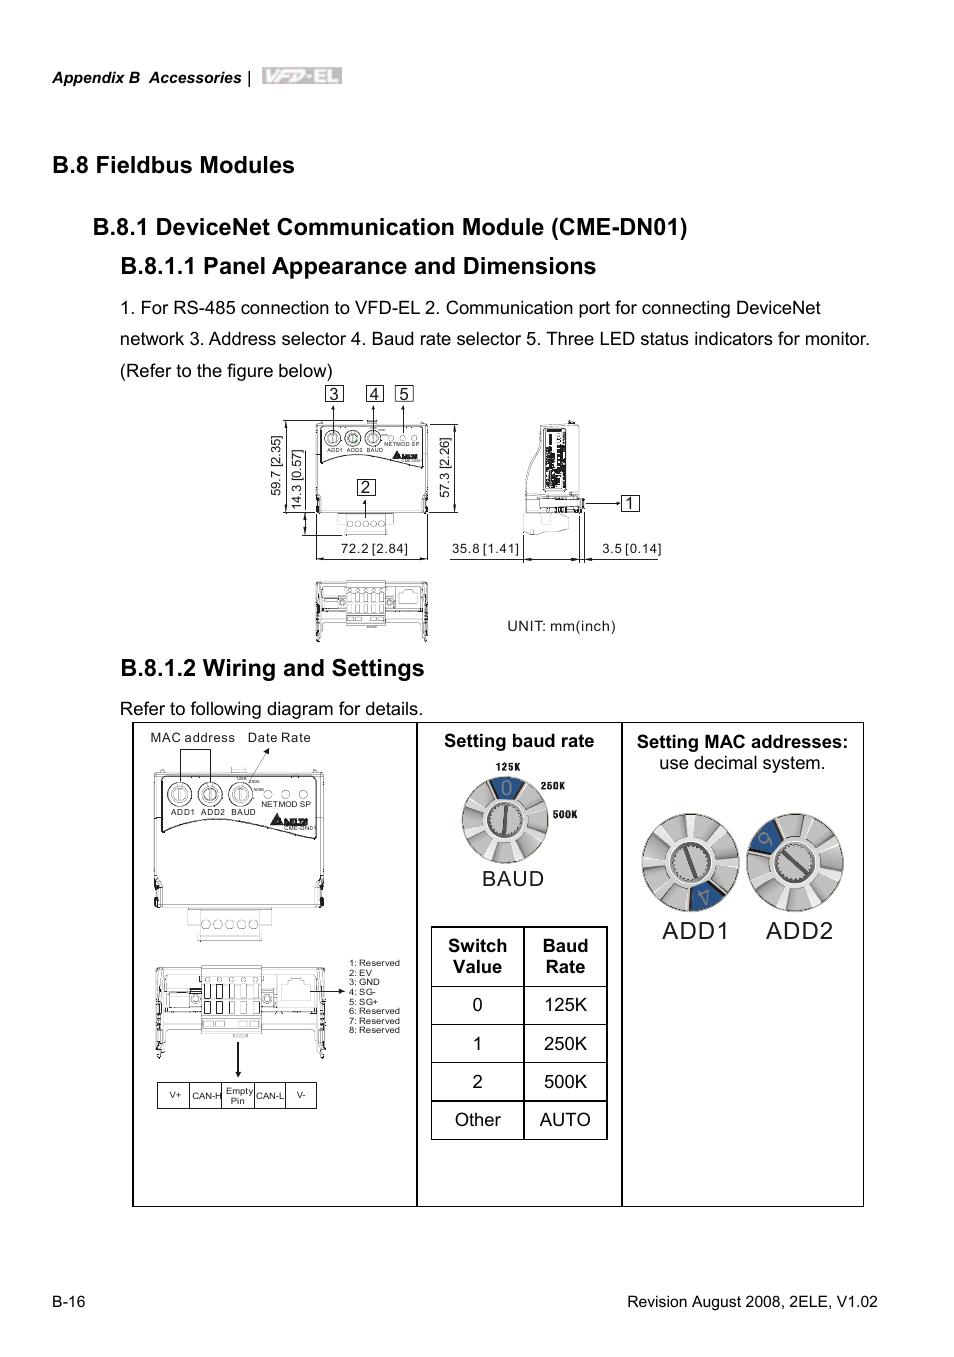 B 8 Fieldbus Modules B 8 1 Devicenet Communication Module Cme Dn01